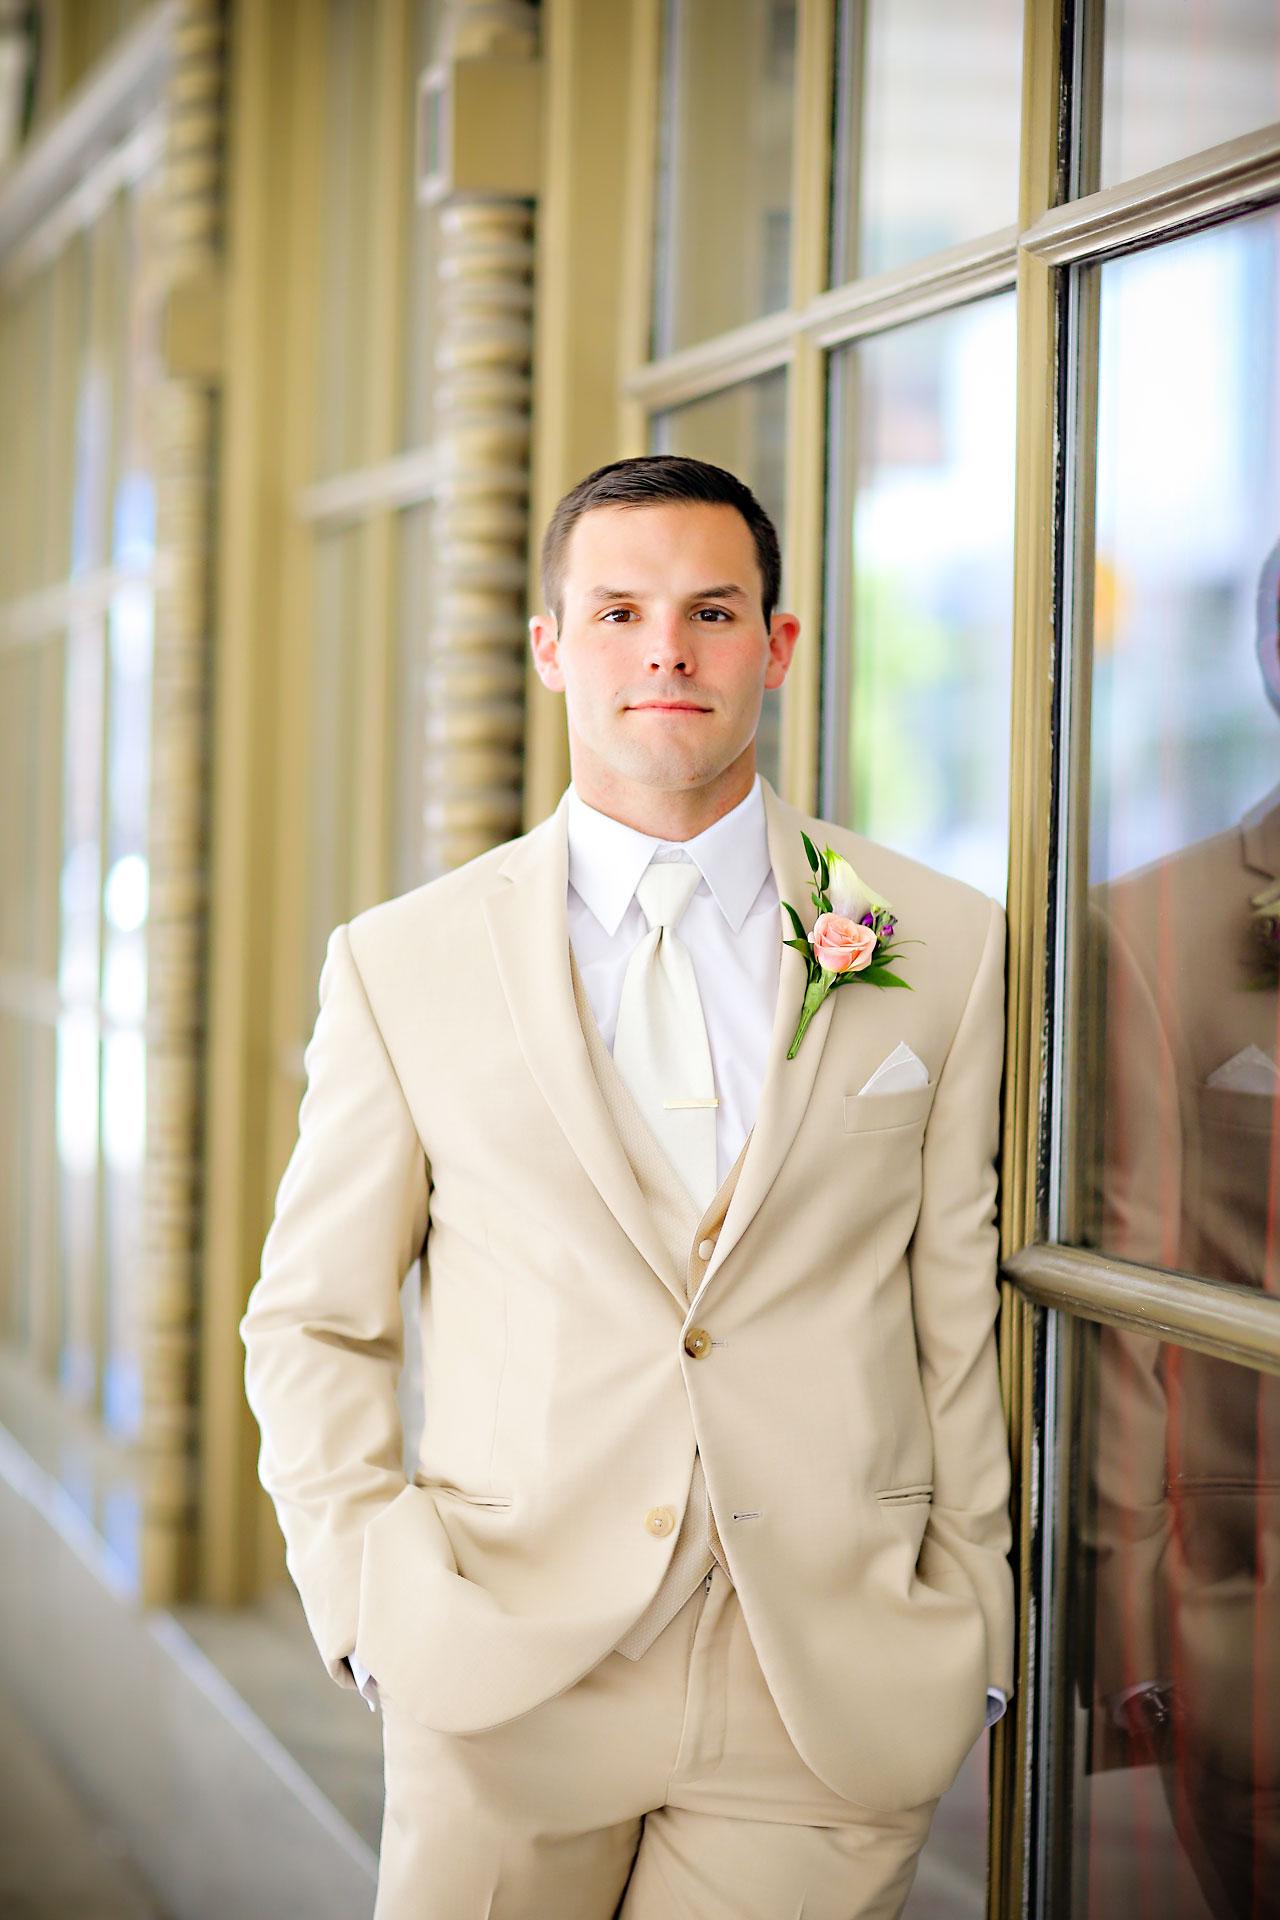 Chandra Kevin Indiana Roof Ballroom wedding 0070